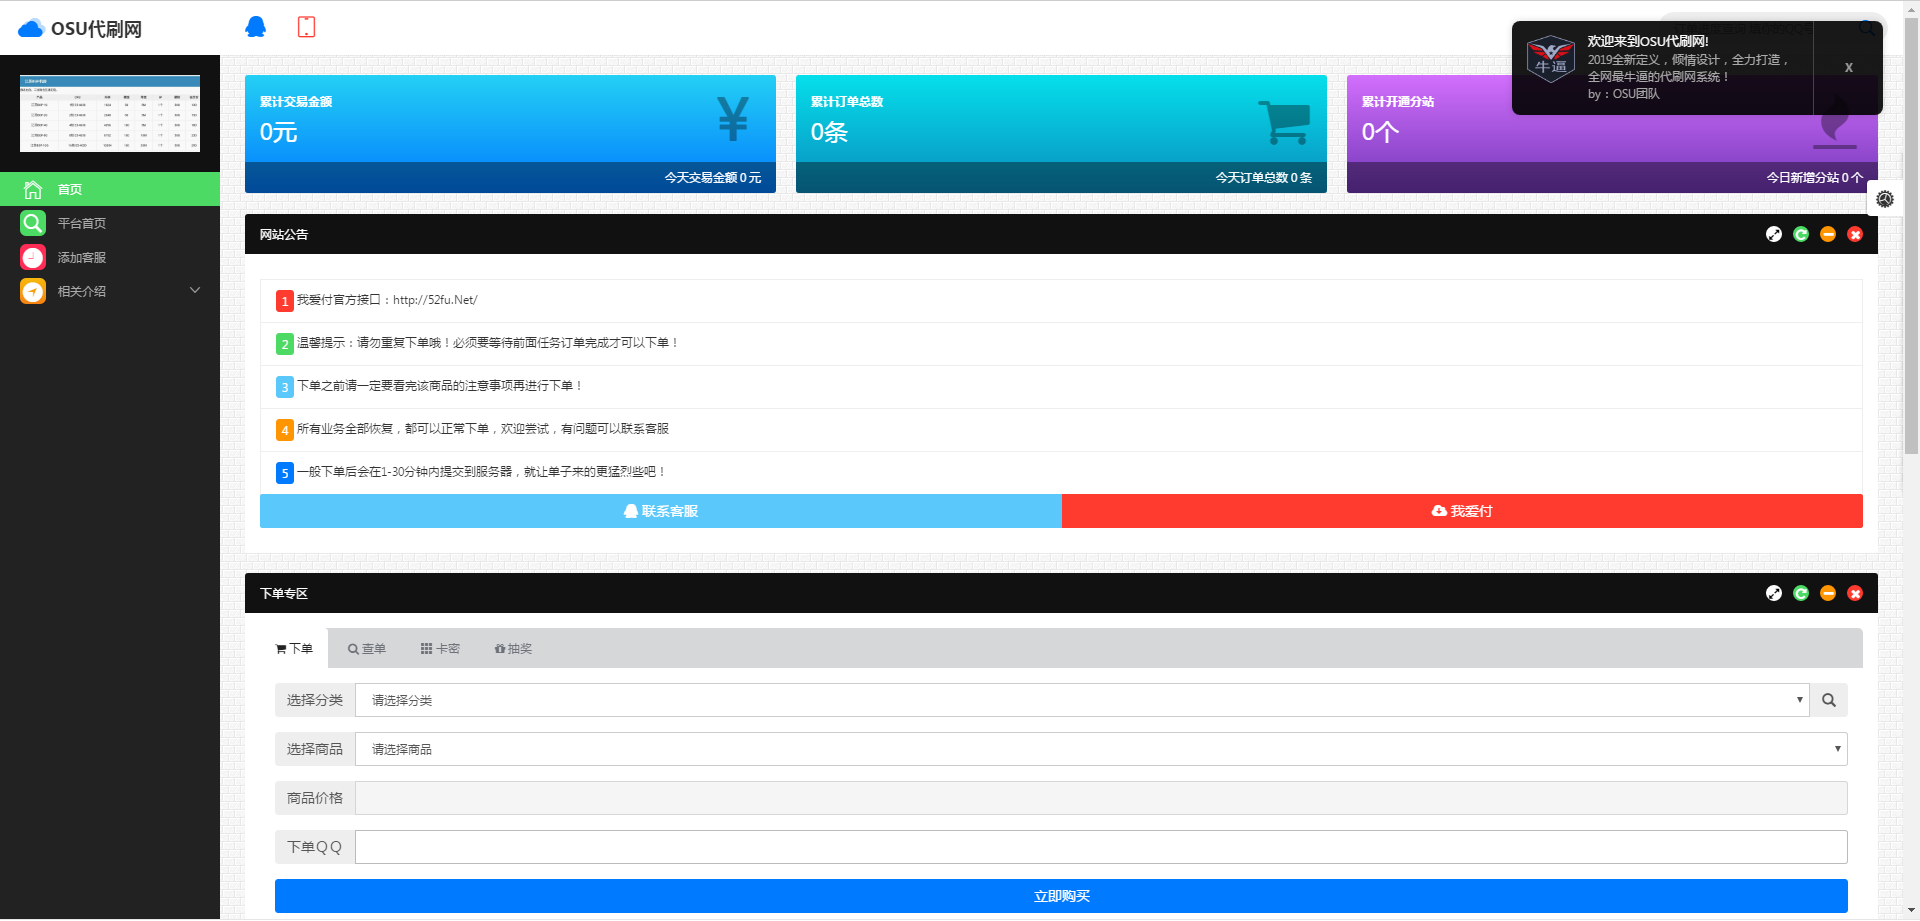 OSU代刷系统源码免签约修复版